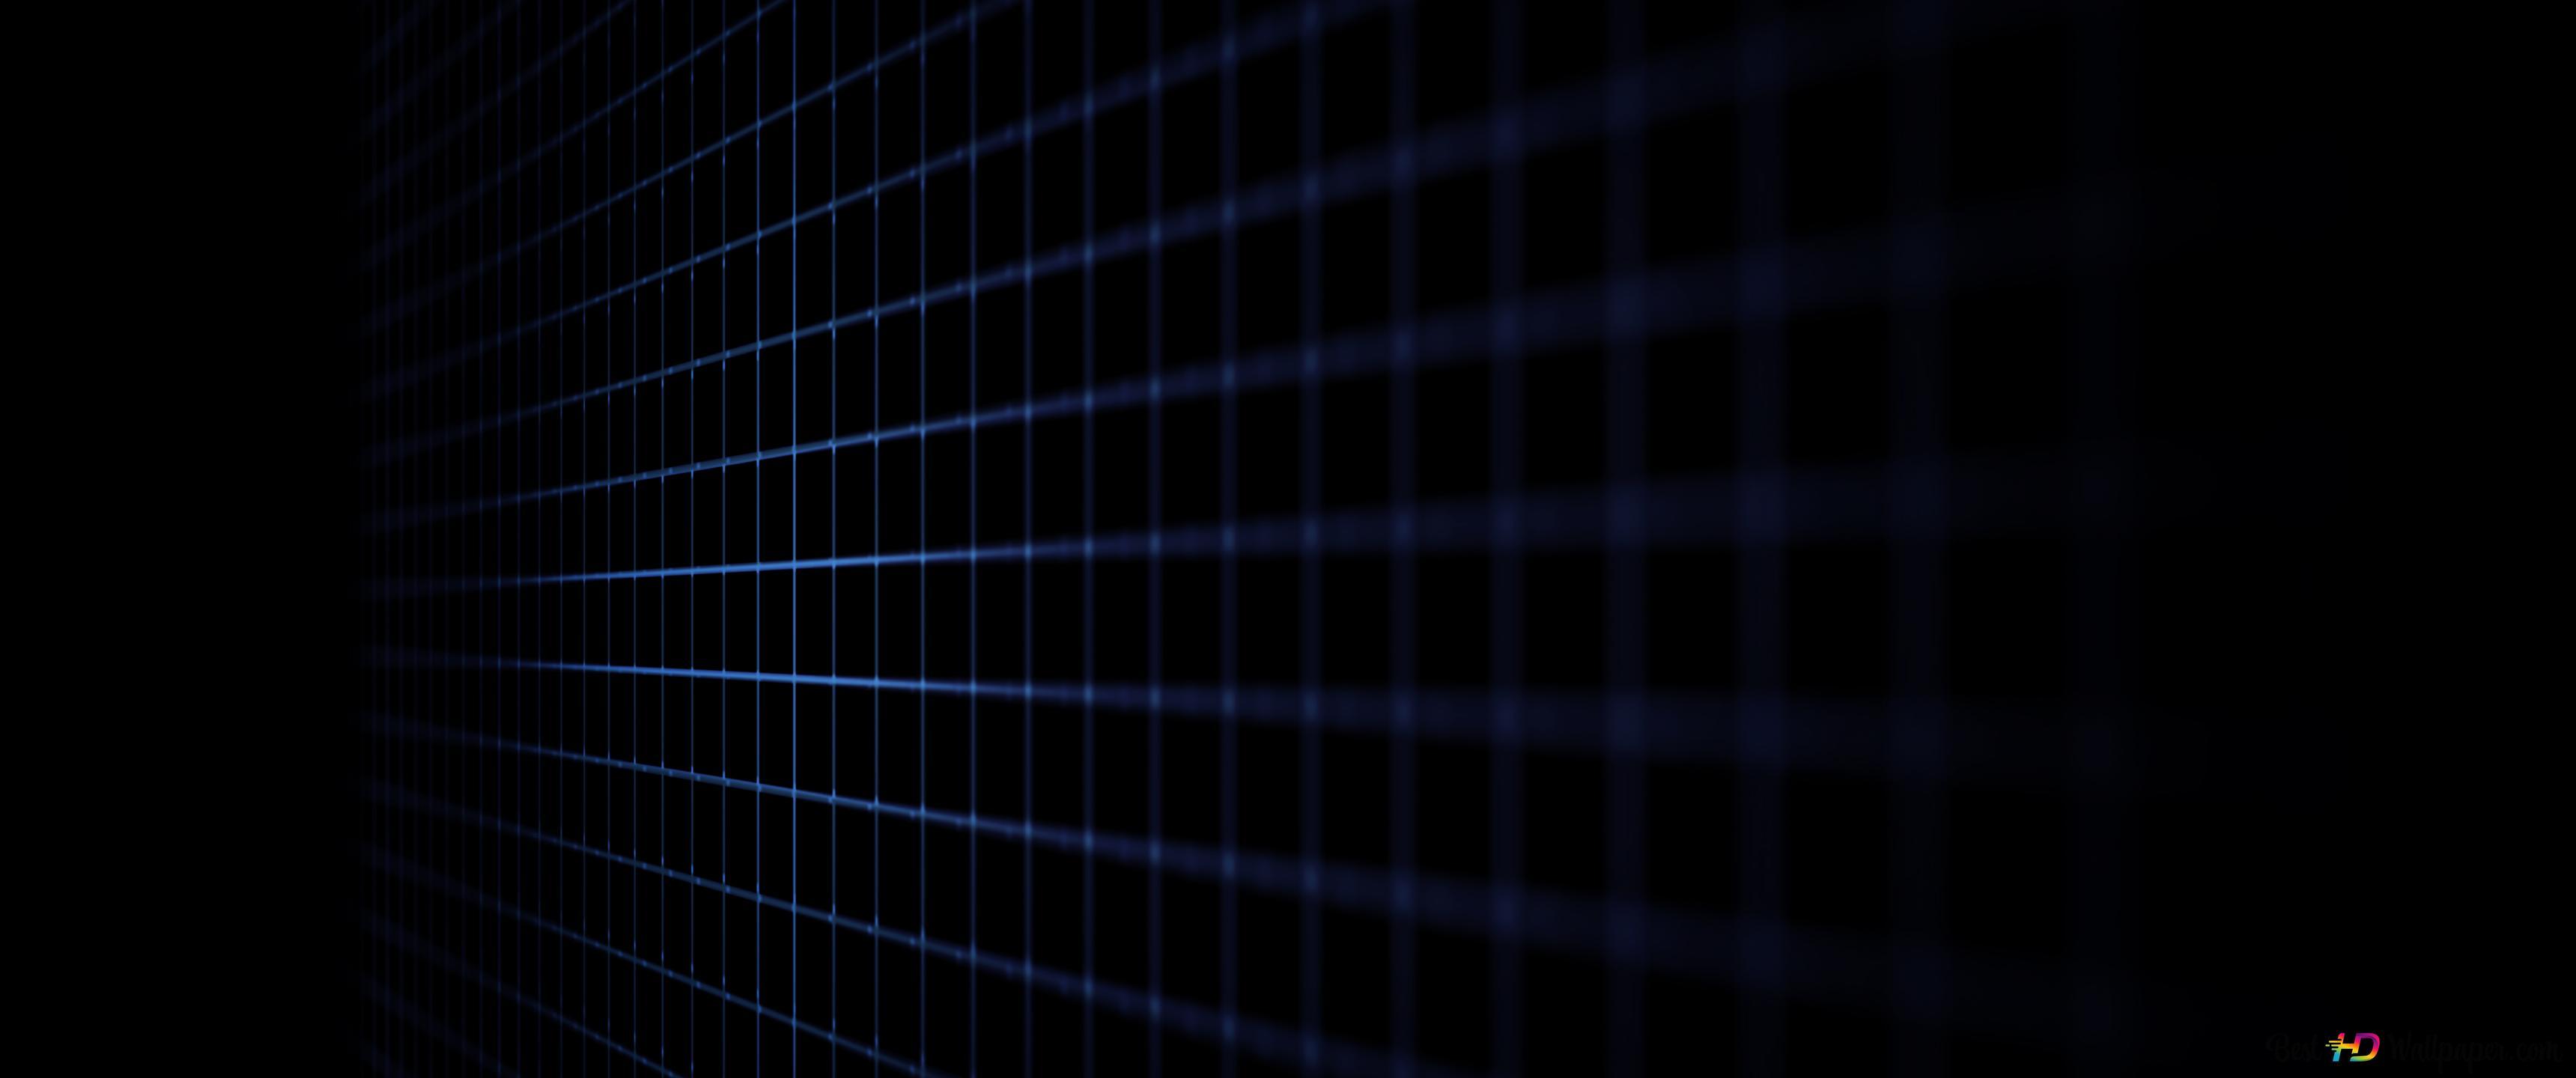 Black Mesh Grids Hd Wallpaper Download